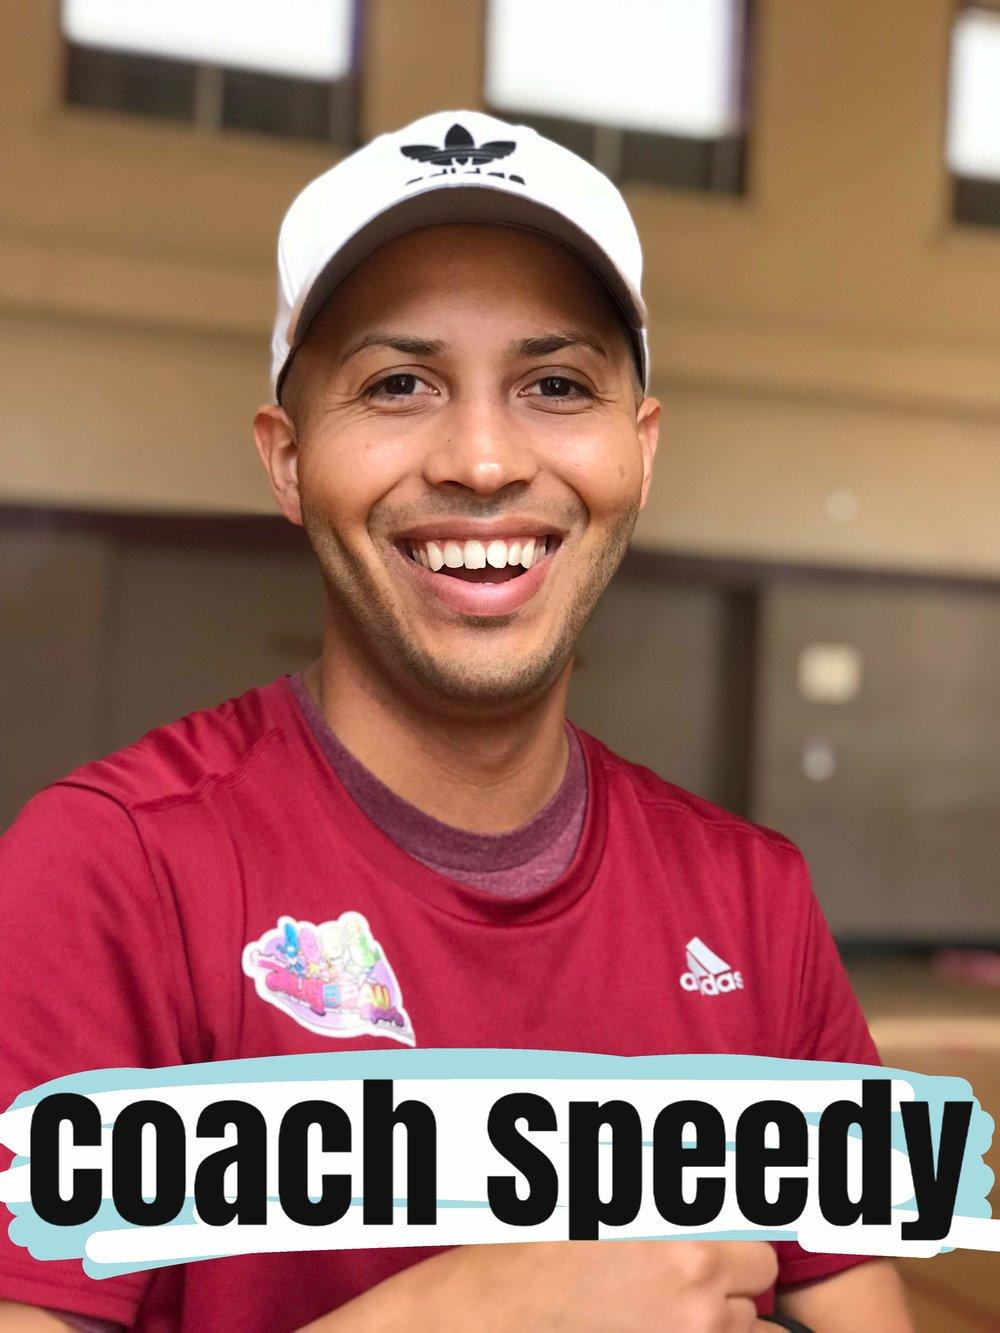 Coach Performer - Speedy